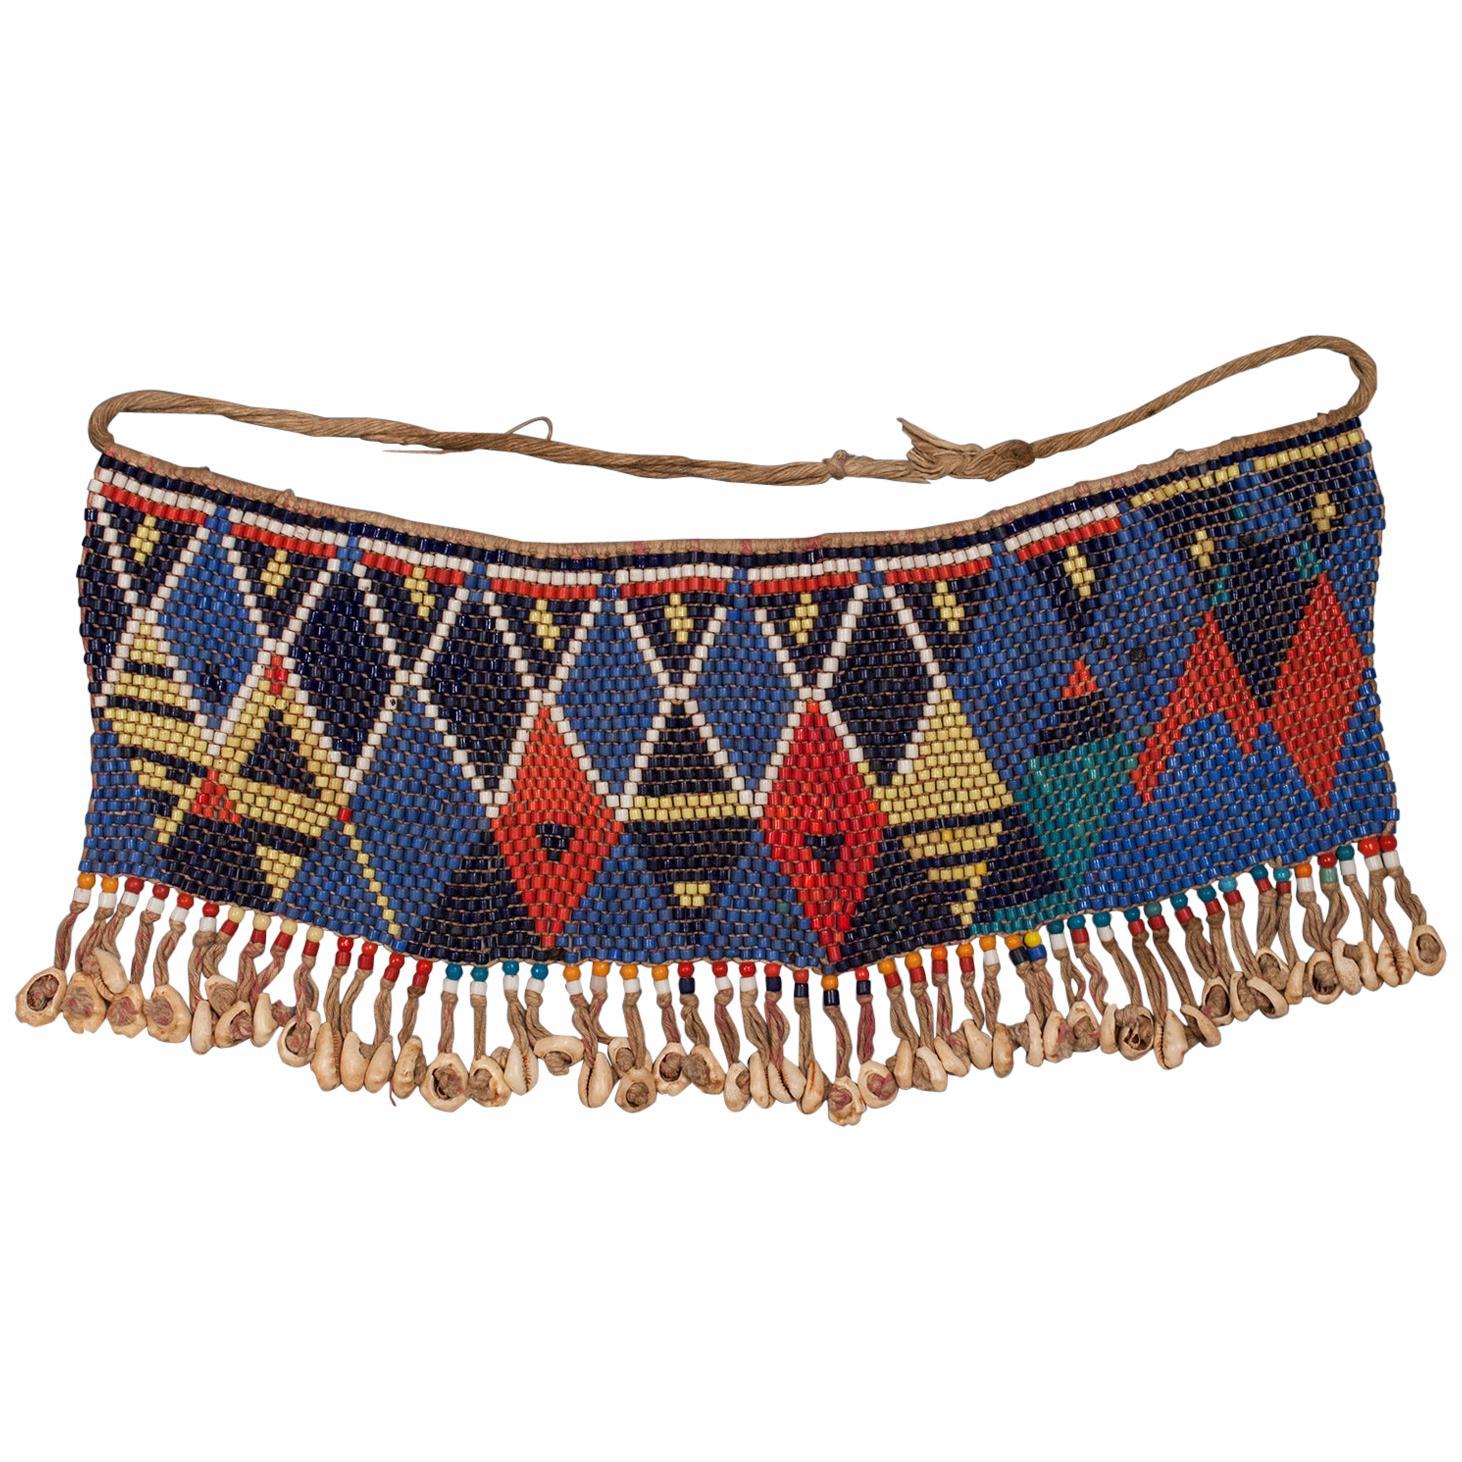 Mid-20th Century Tribal Beaded Cache-Sexe Modesty Apron, Cameroon